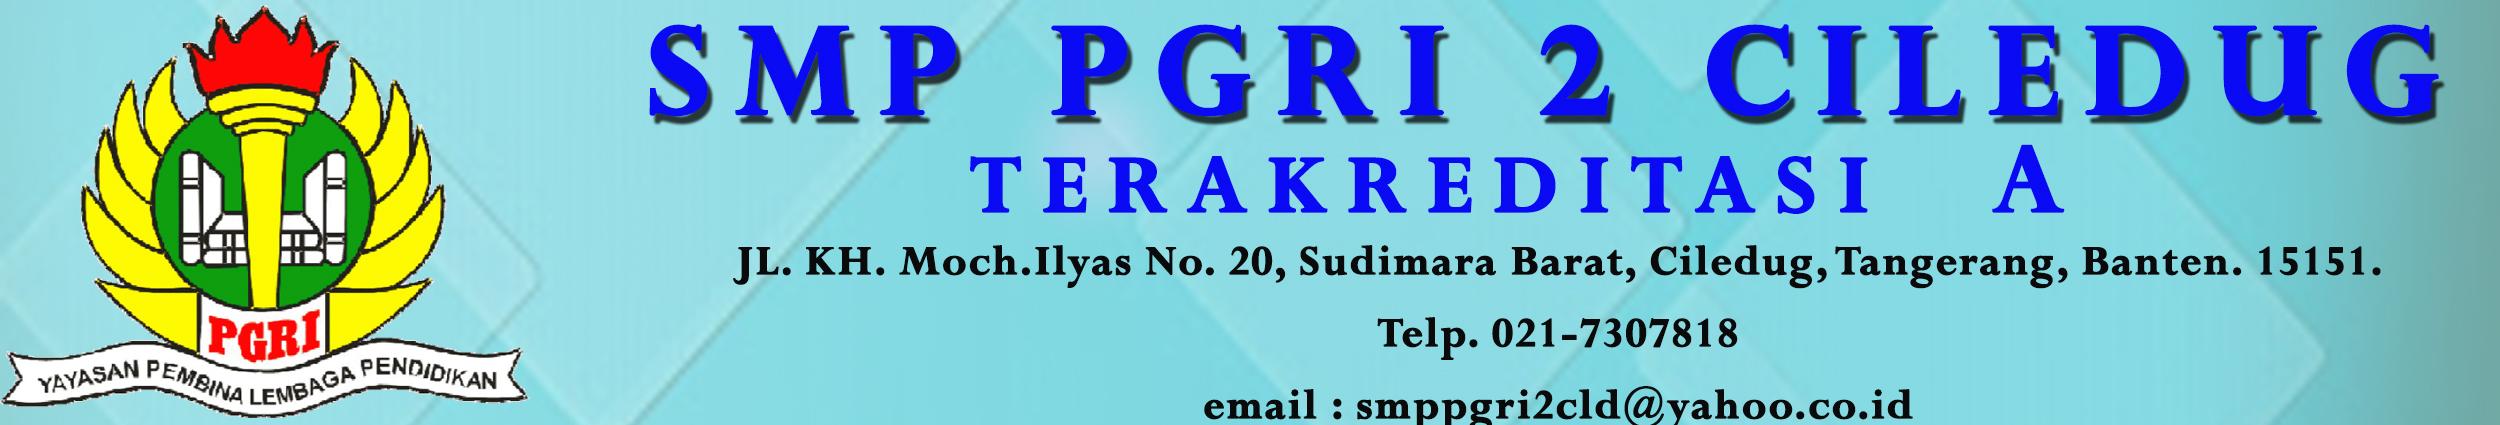 Logo for SMP PGRI 2 Ciledug